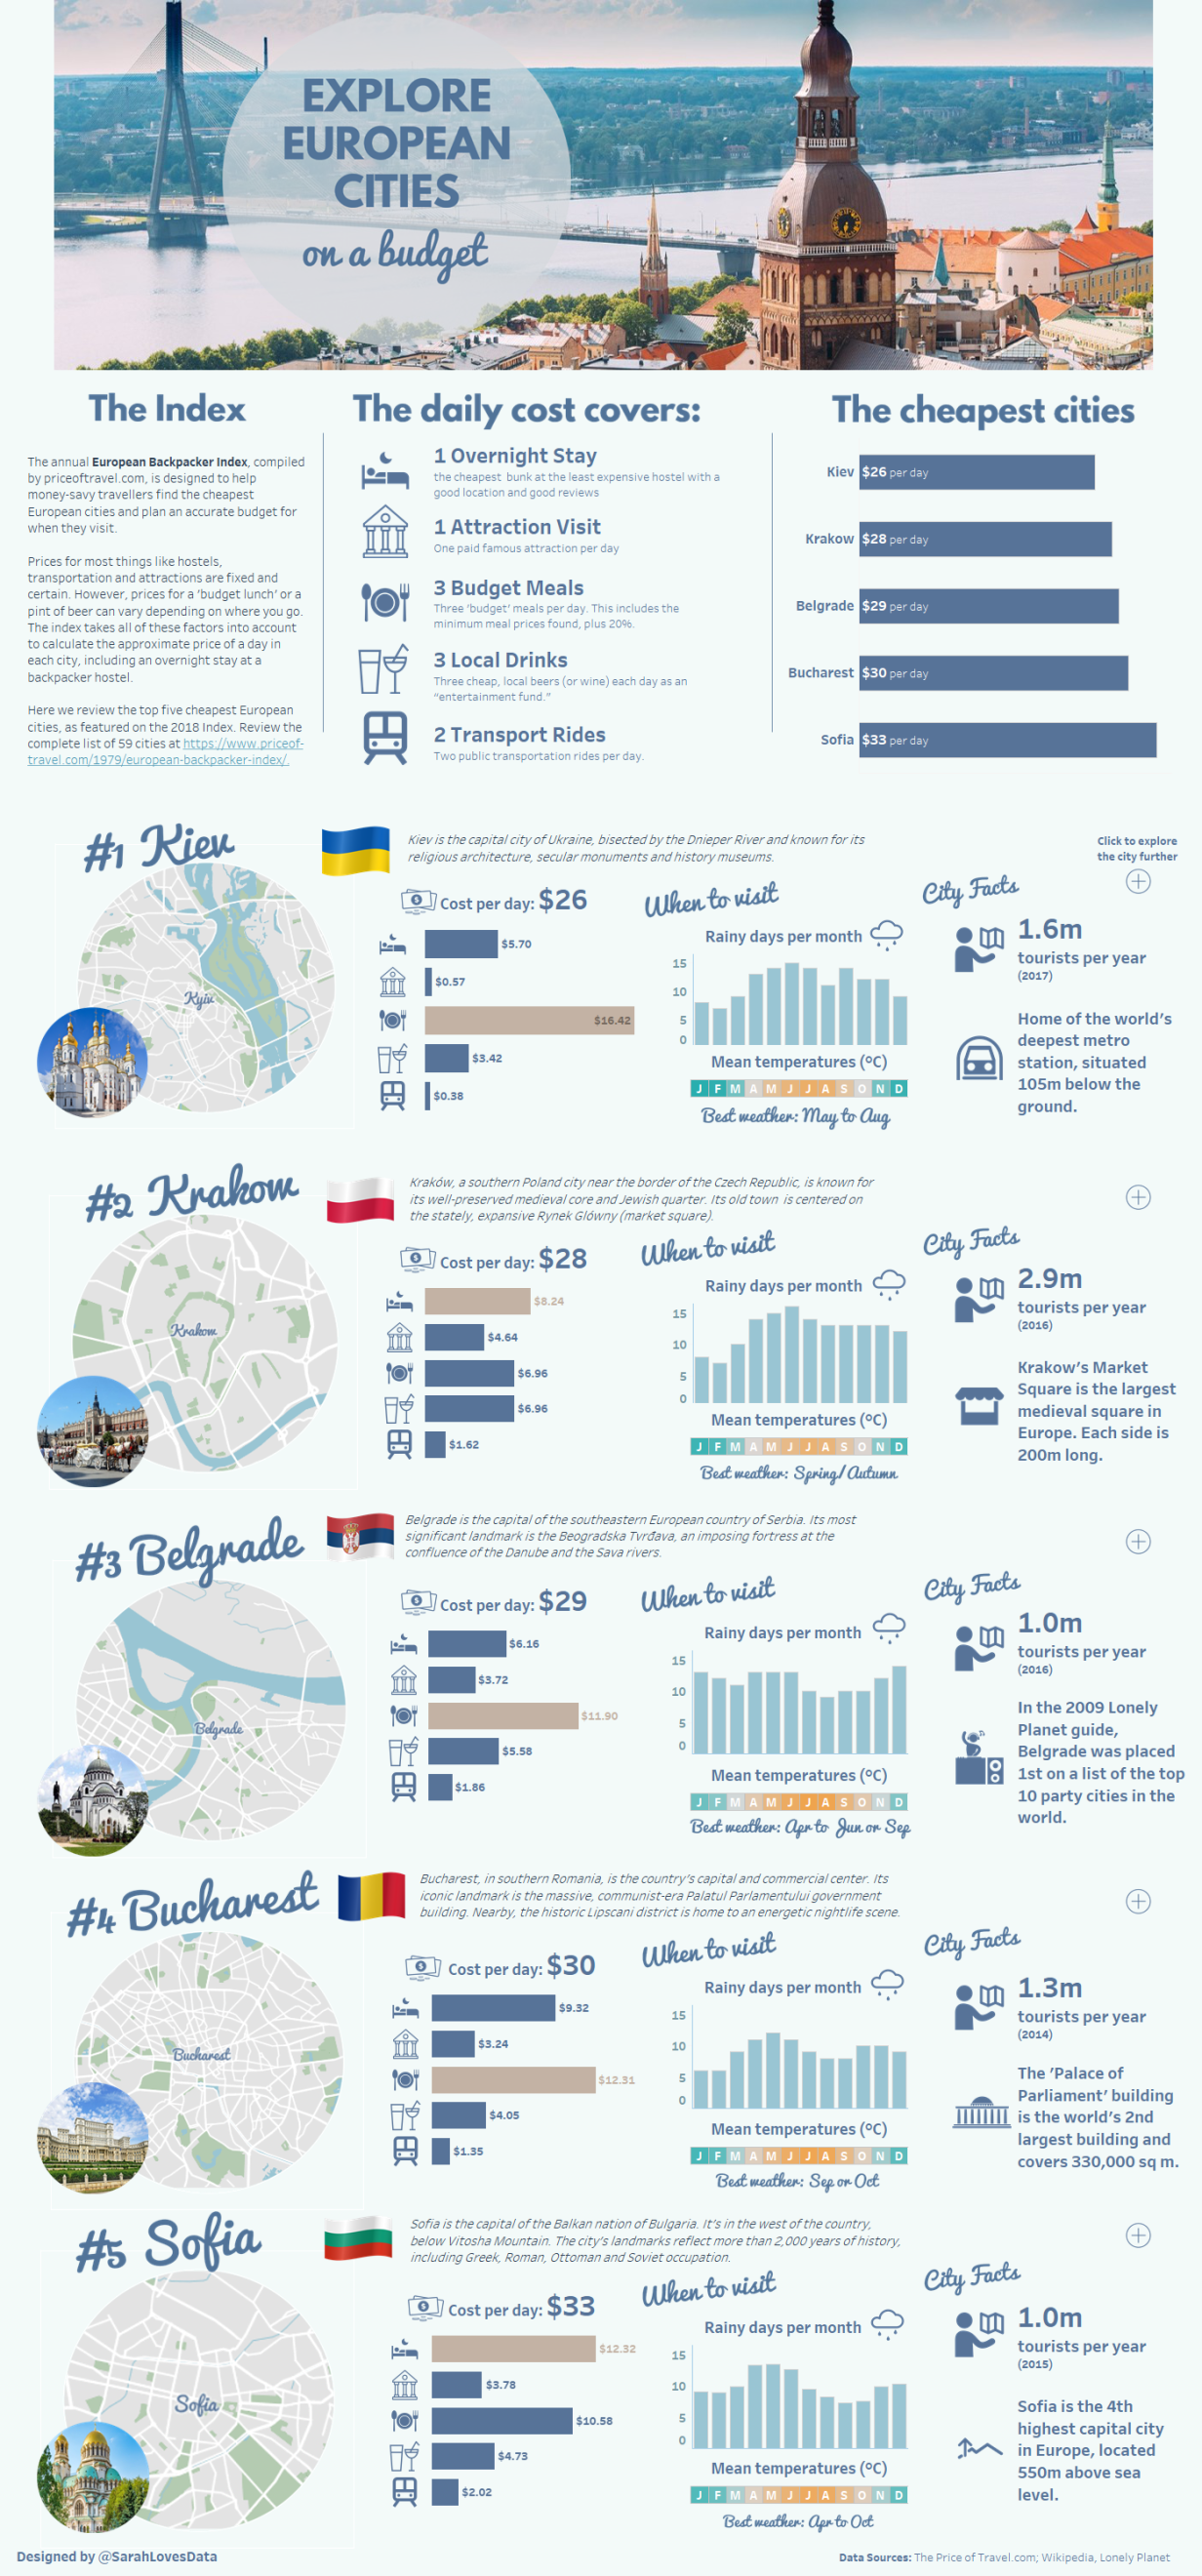 """Explore European Cities on a Budget"" by Sarah Bartlett"